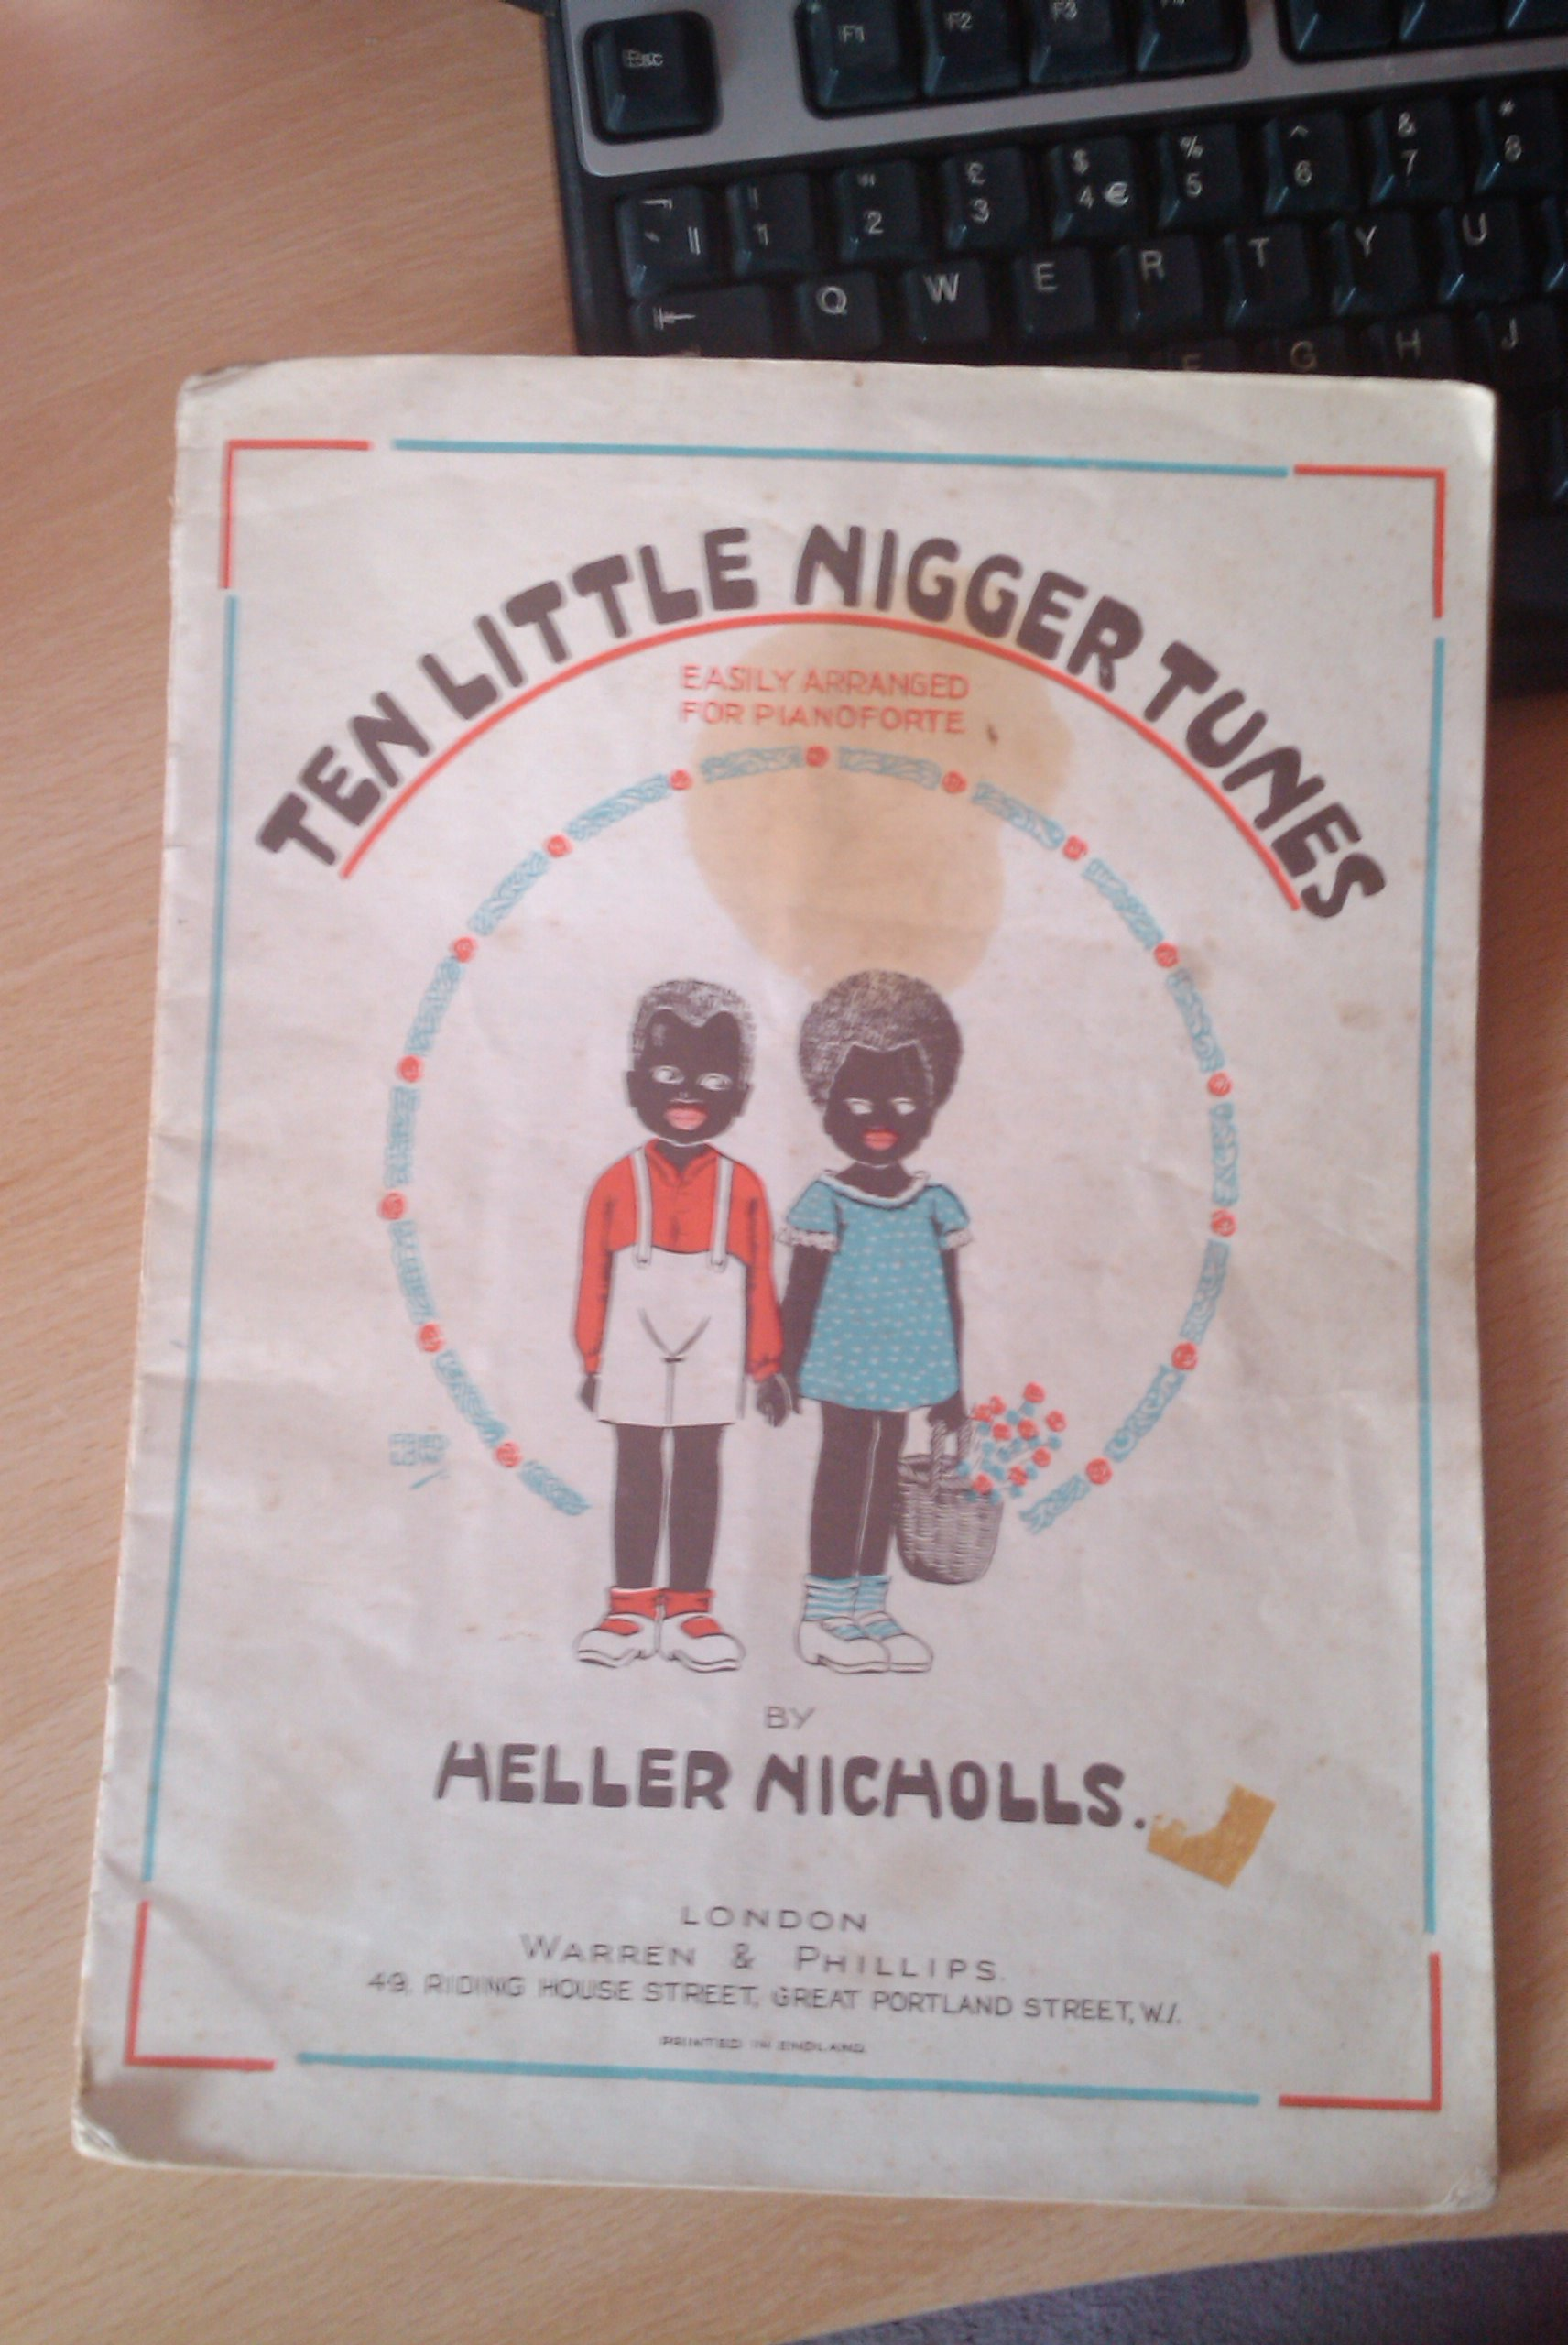 racist album